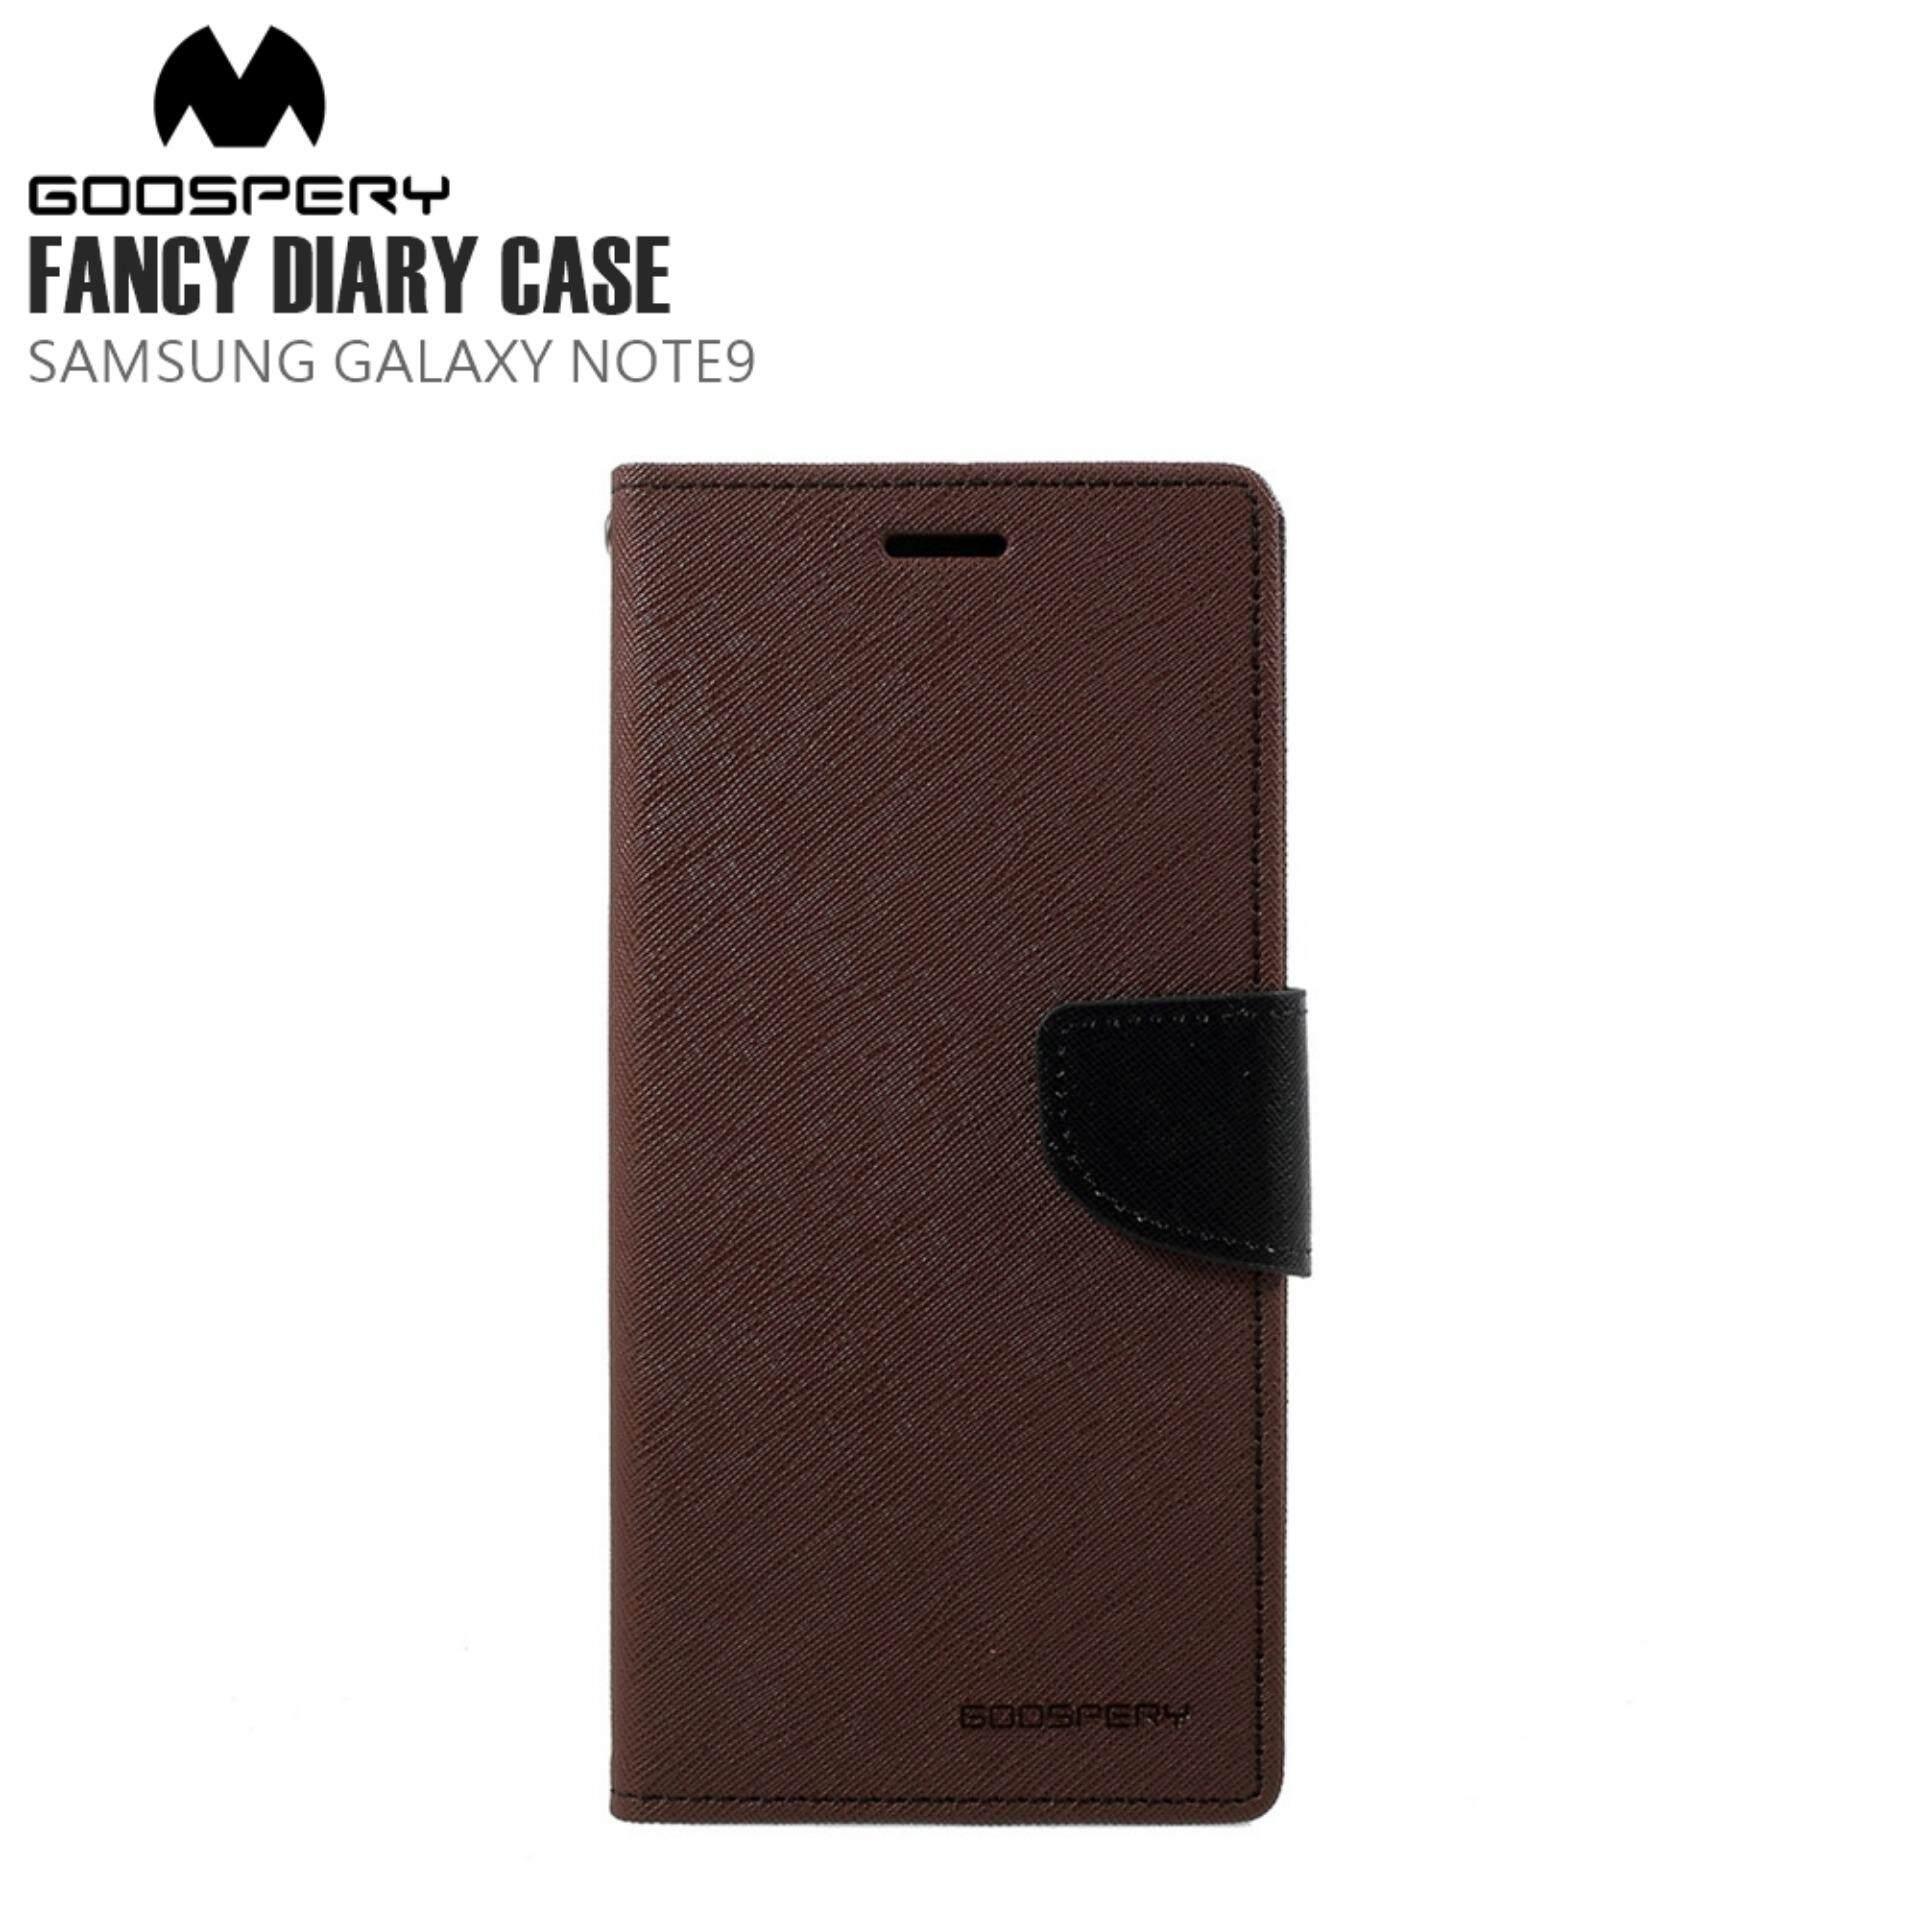 Mercury Goospery Phone Cases Samsung Galaxy Note 9 N960 Fancy Diary Case Mint Navy Goodspery Note9 Brown